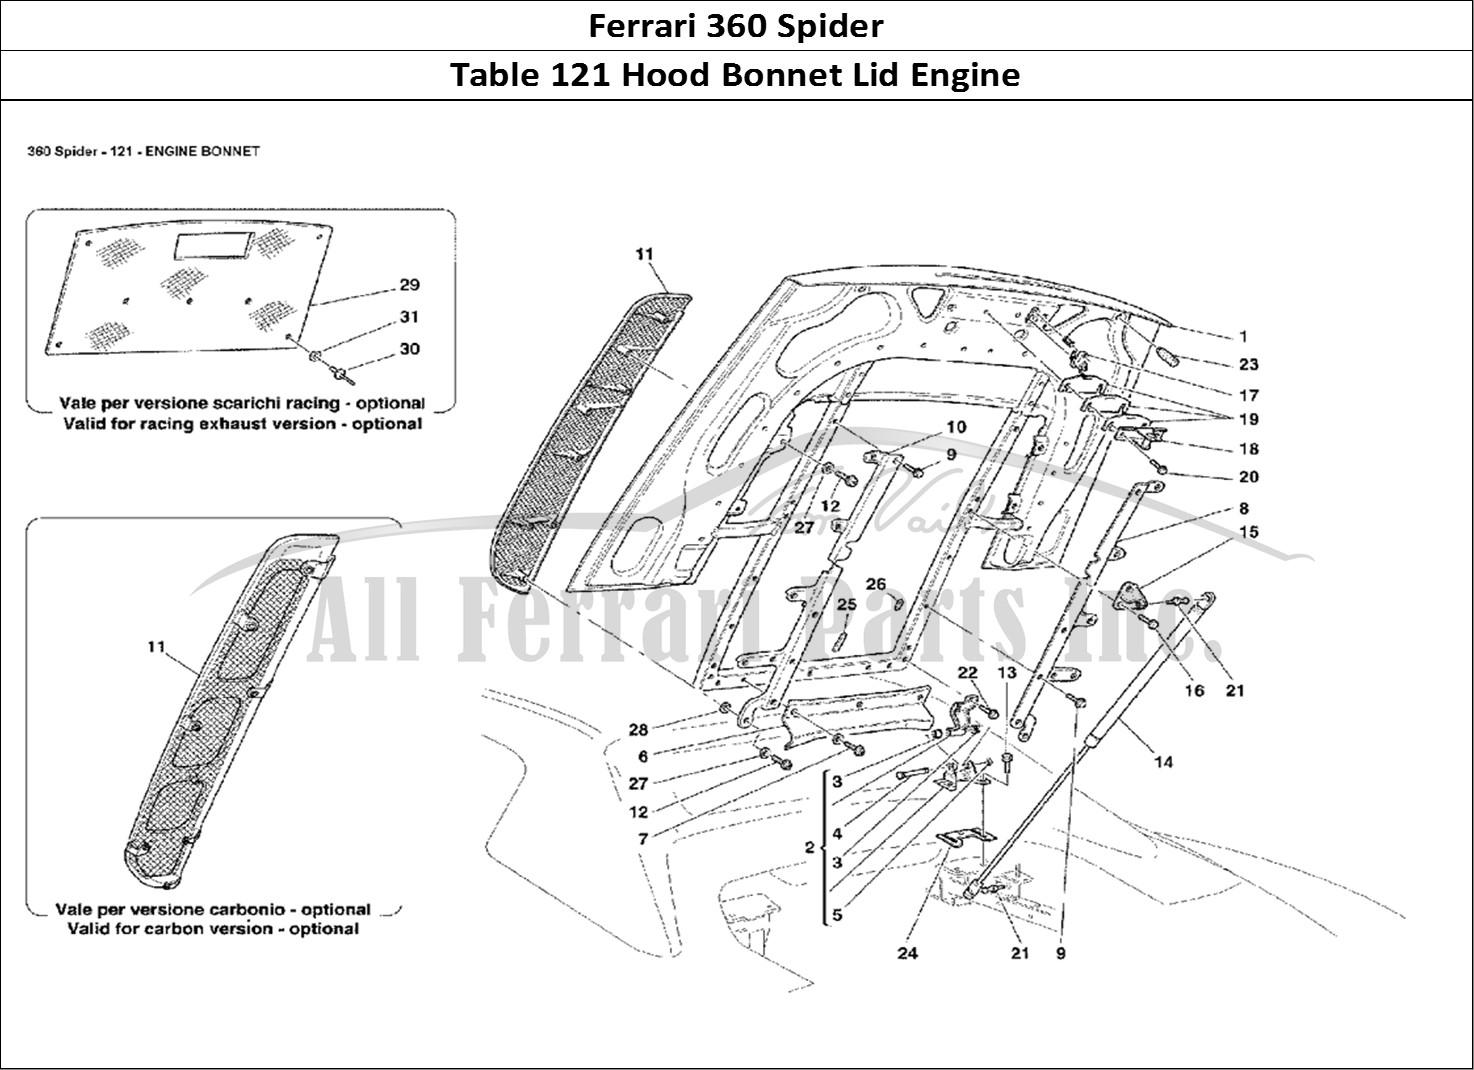 Buy Original Ferrari 360 Spider 121 Hood Bonnet Lid Engine